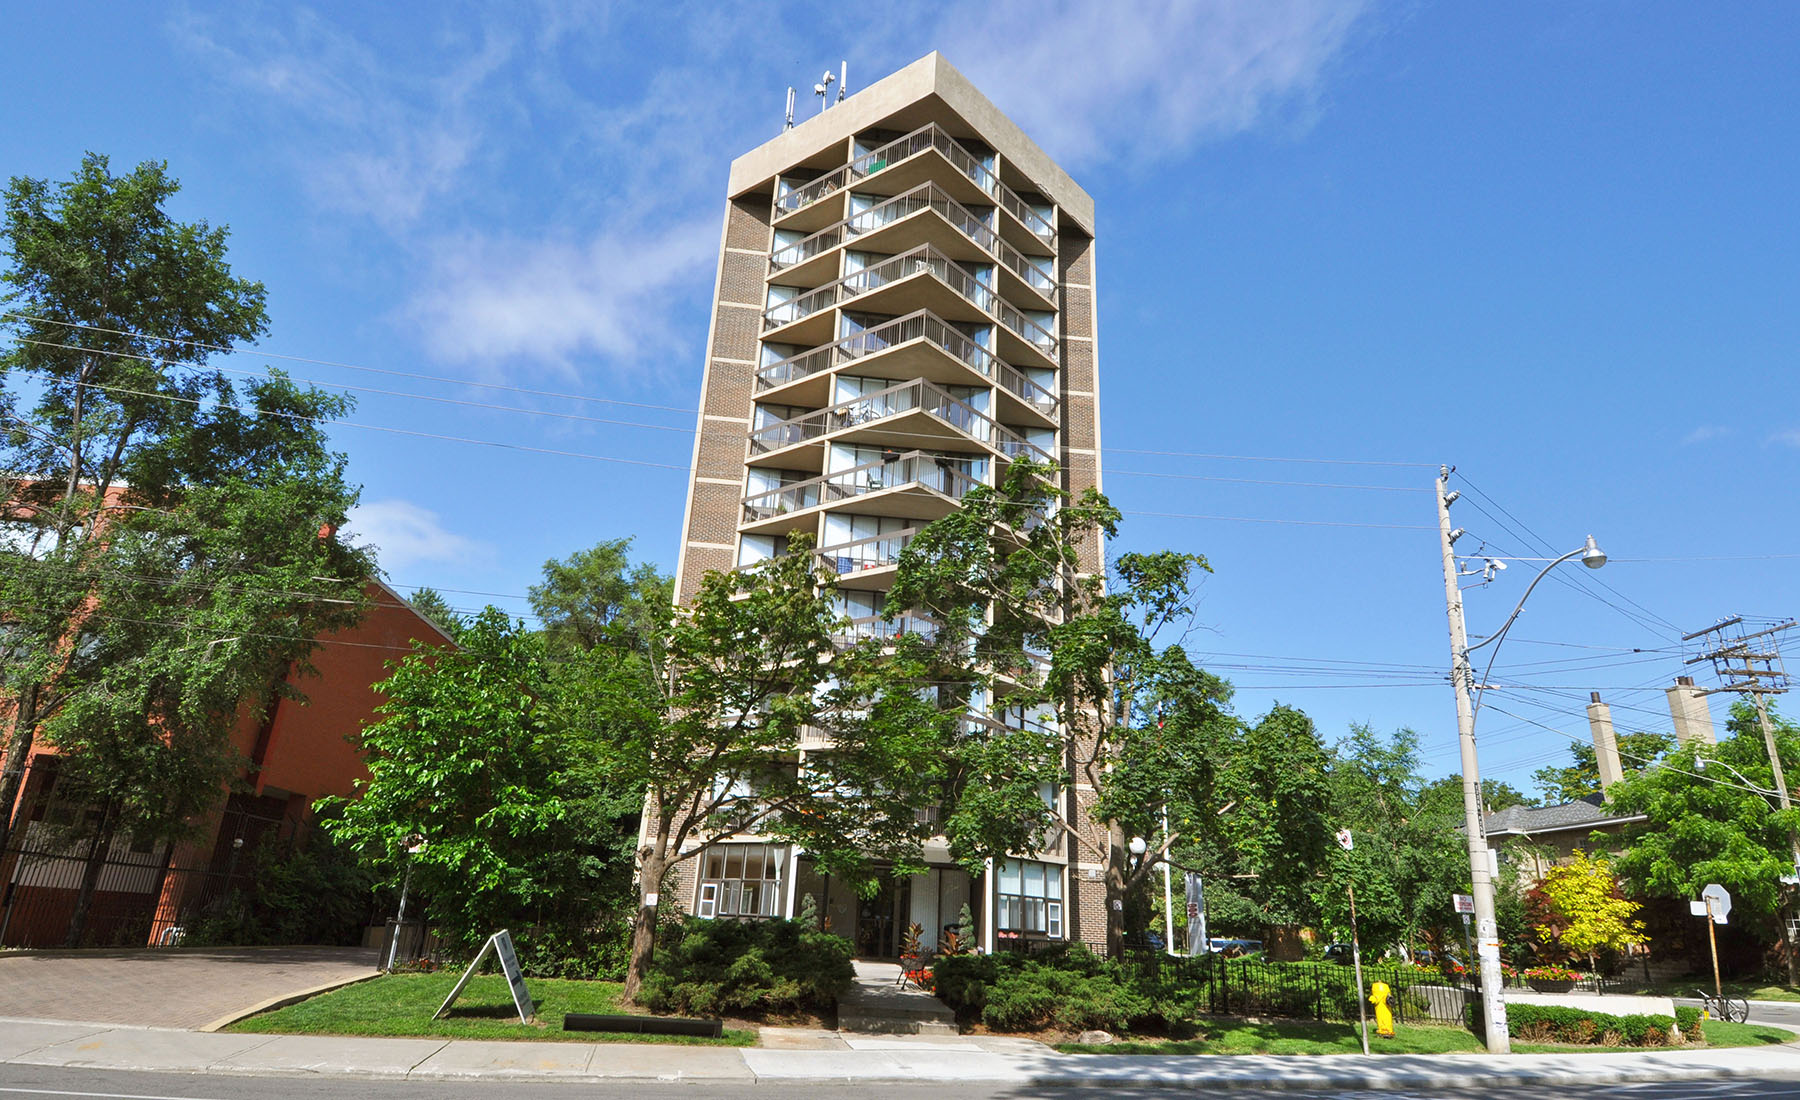 Sensational 250 St George Hollyburn Properties Download Free Architecture Designs Sospemadebymaigaardcom